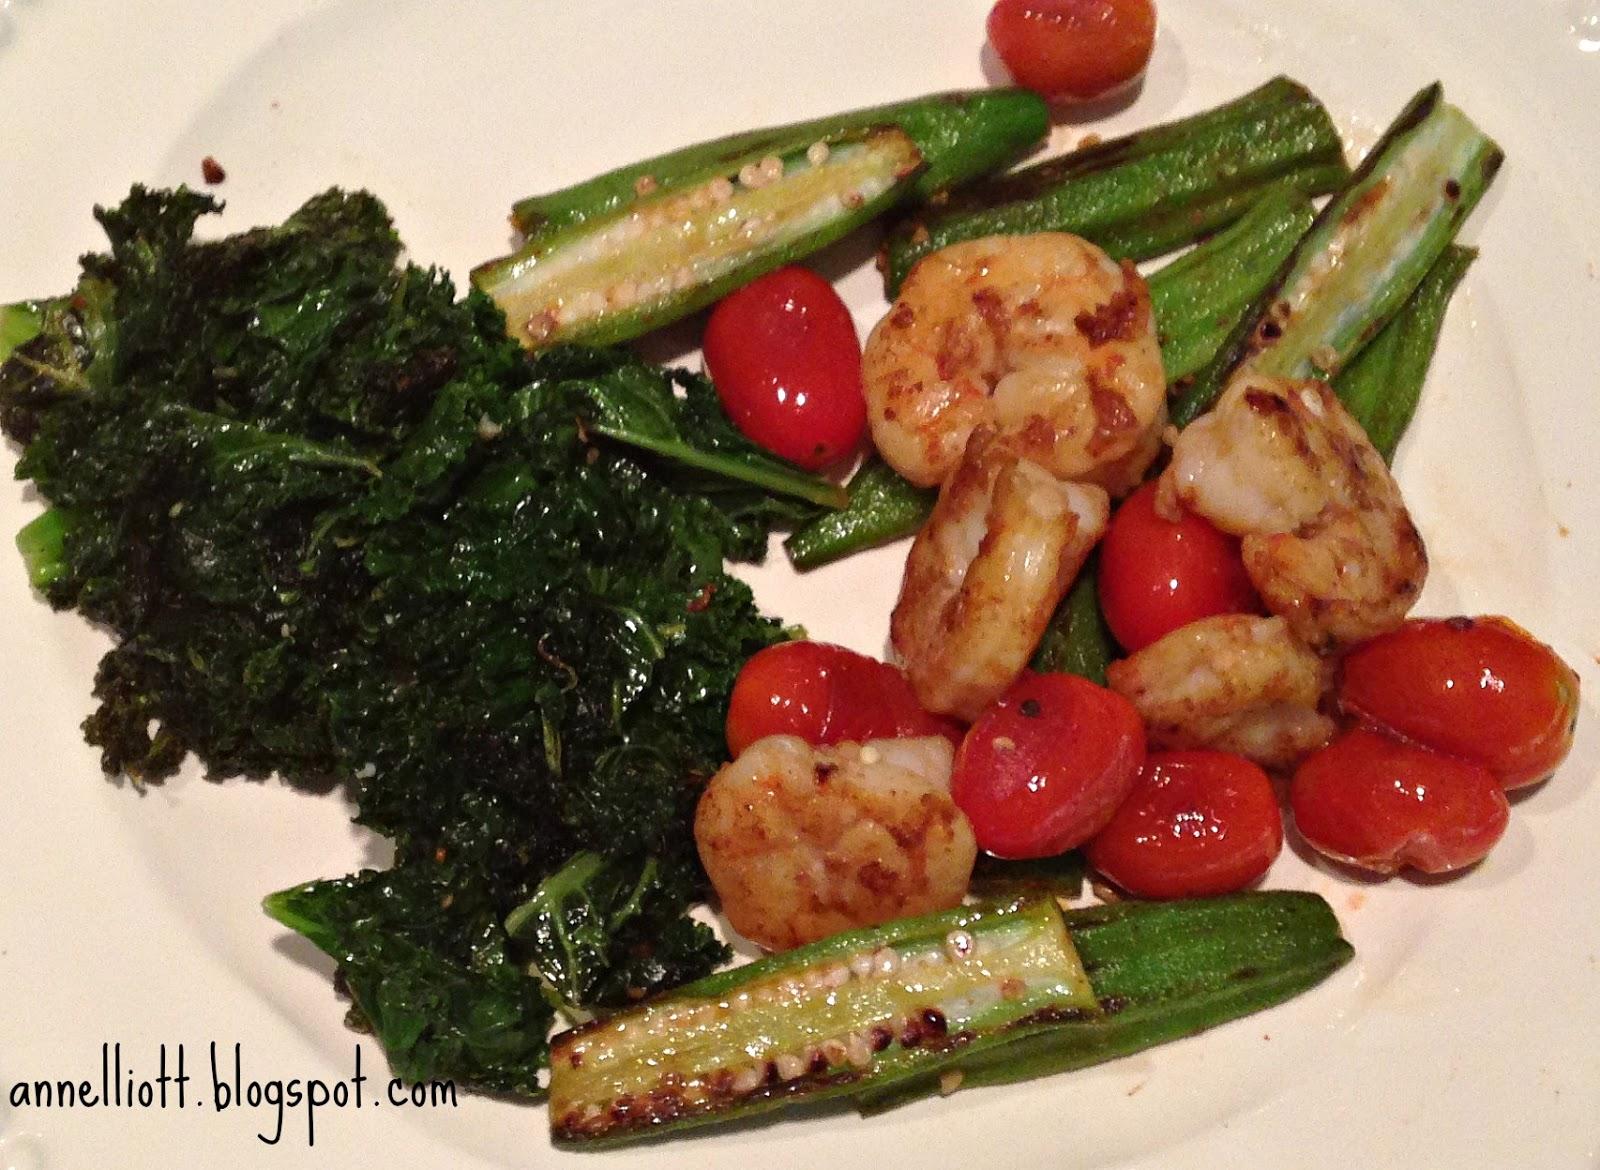 ann elliott: skillet roasted shrimp and okra